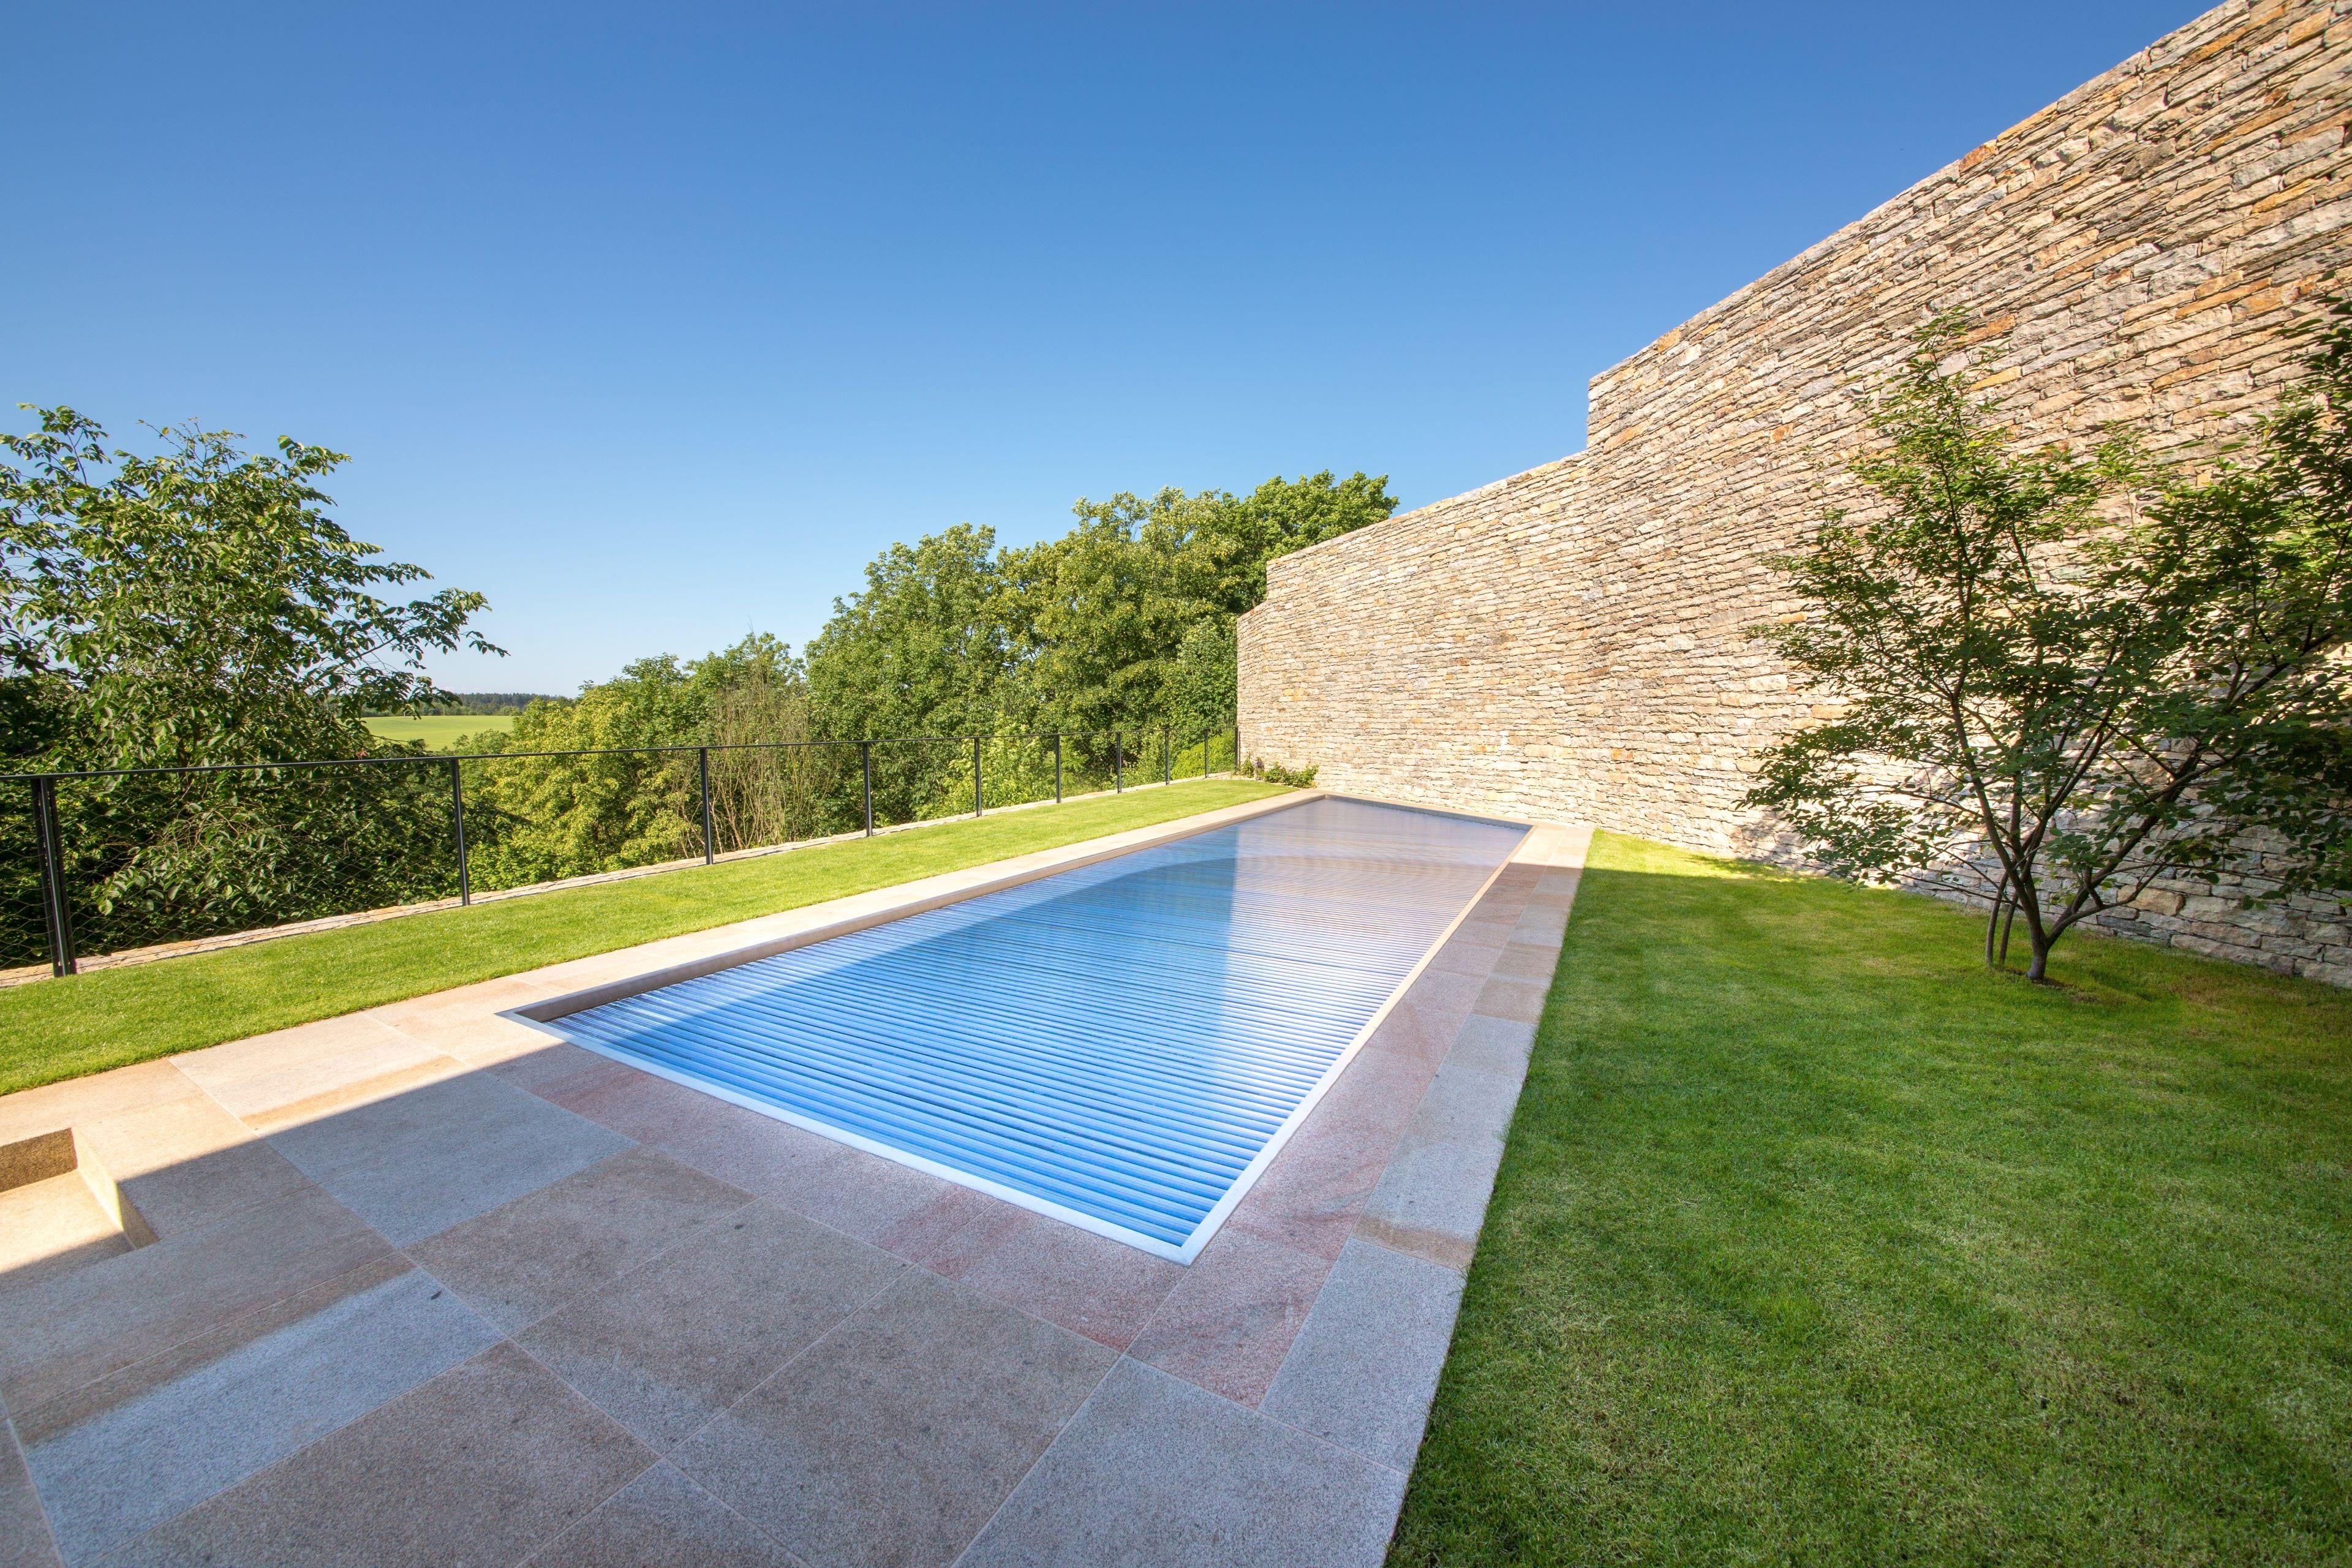 Stainless-Steel Pool in Geometric Modern Design